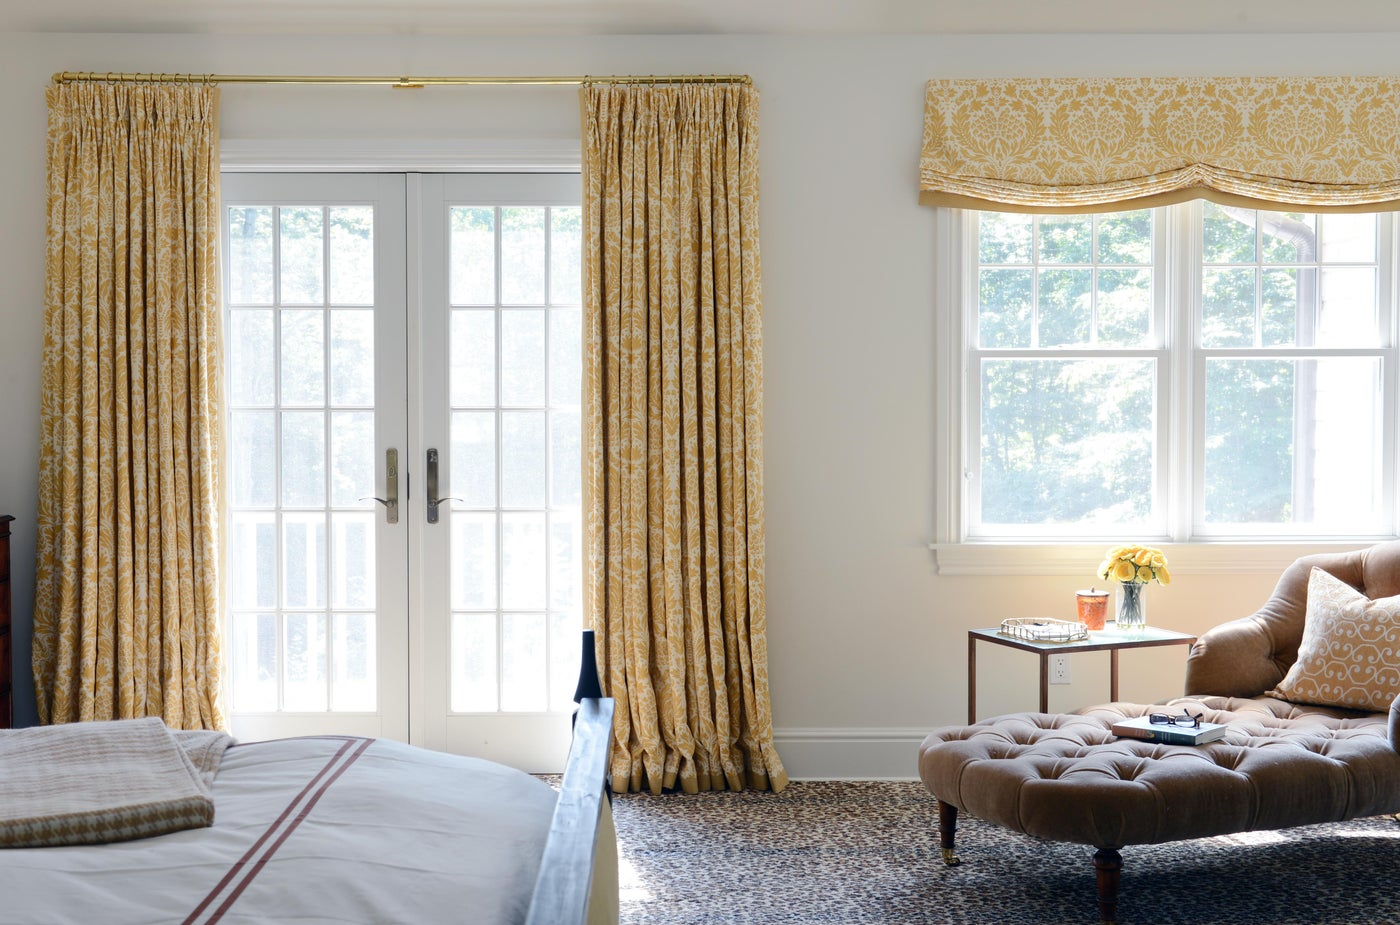 A Sunny Master Bedroom